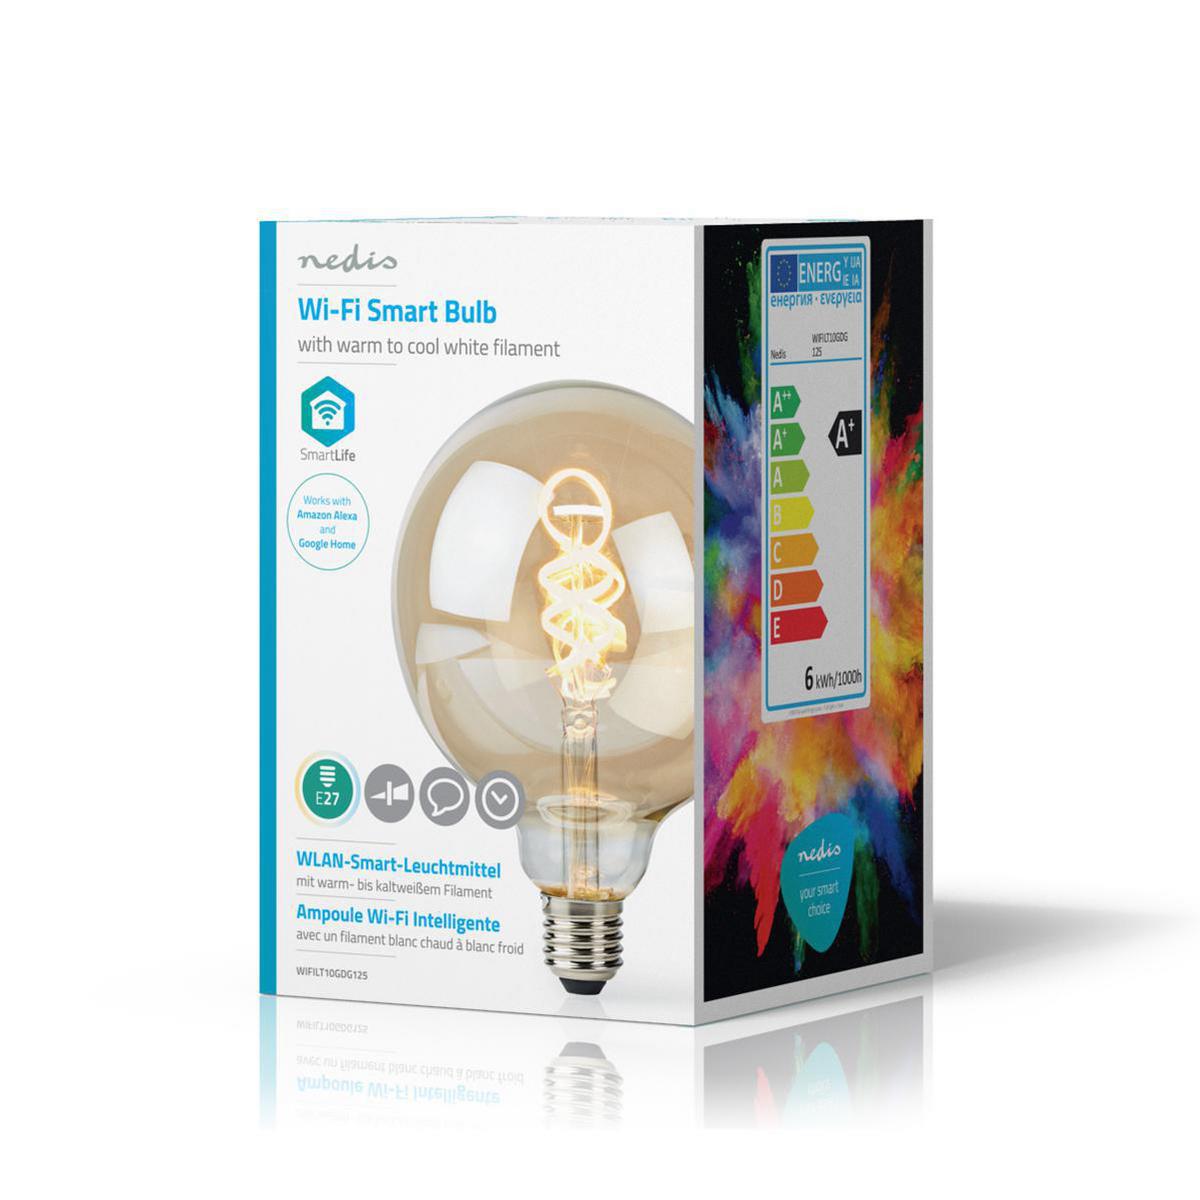 Globe spiraal lamp G125 - 125mm - LED slimme lamp - Amber - dimbaar - app besturing - filament - verpakking